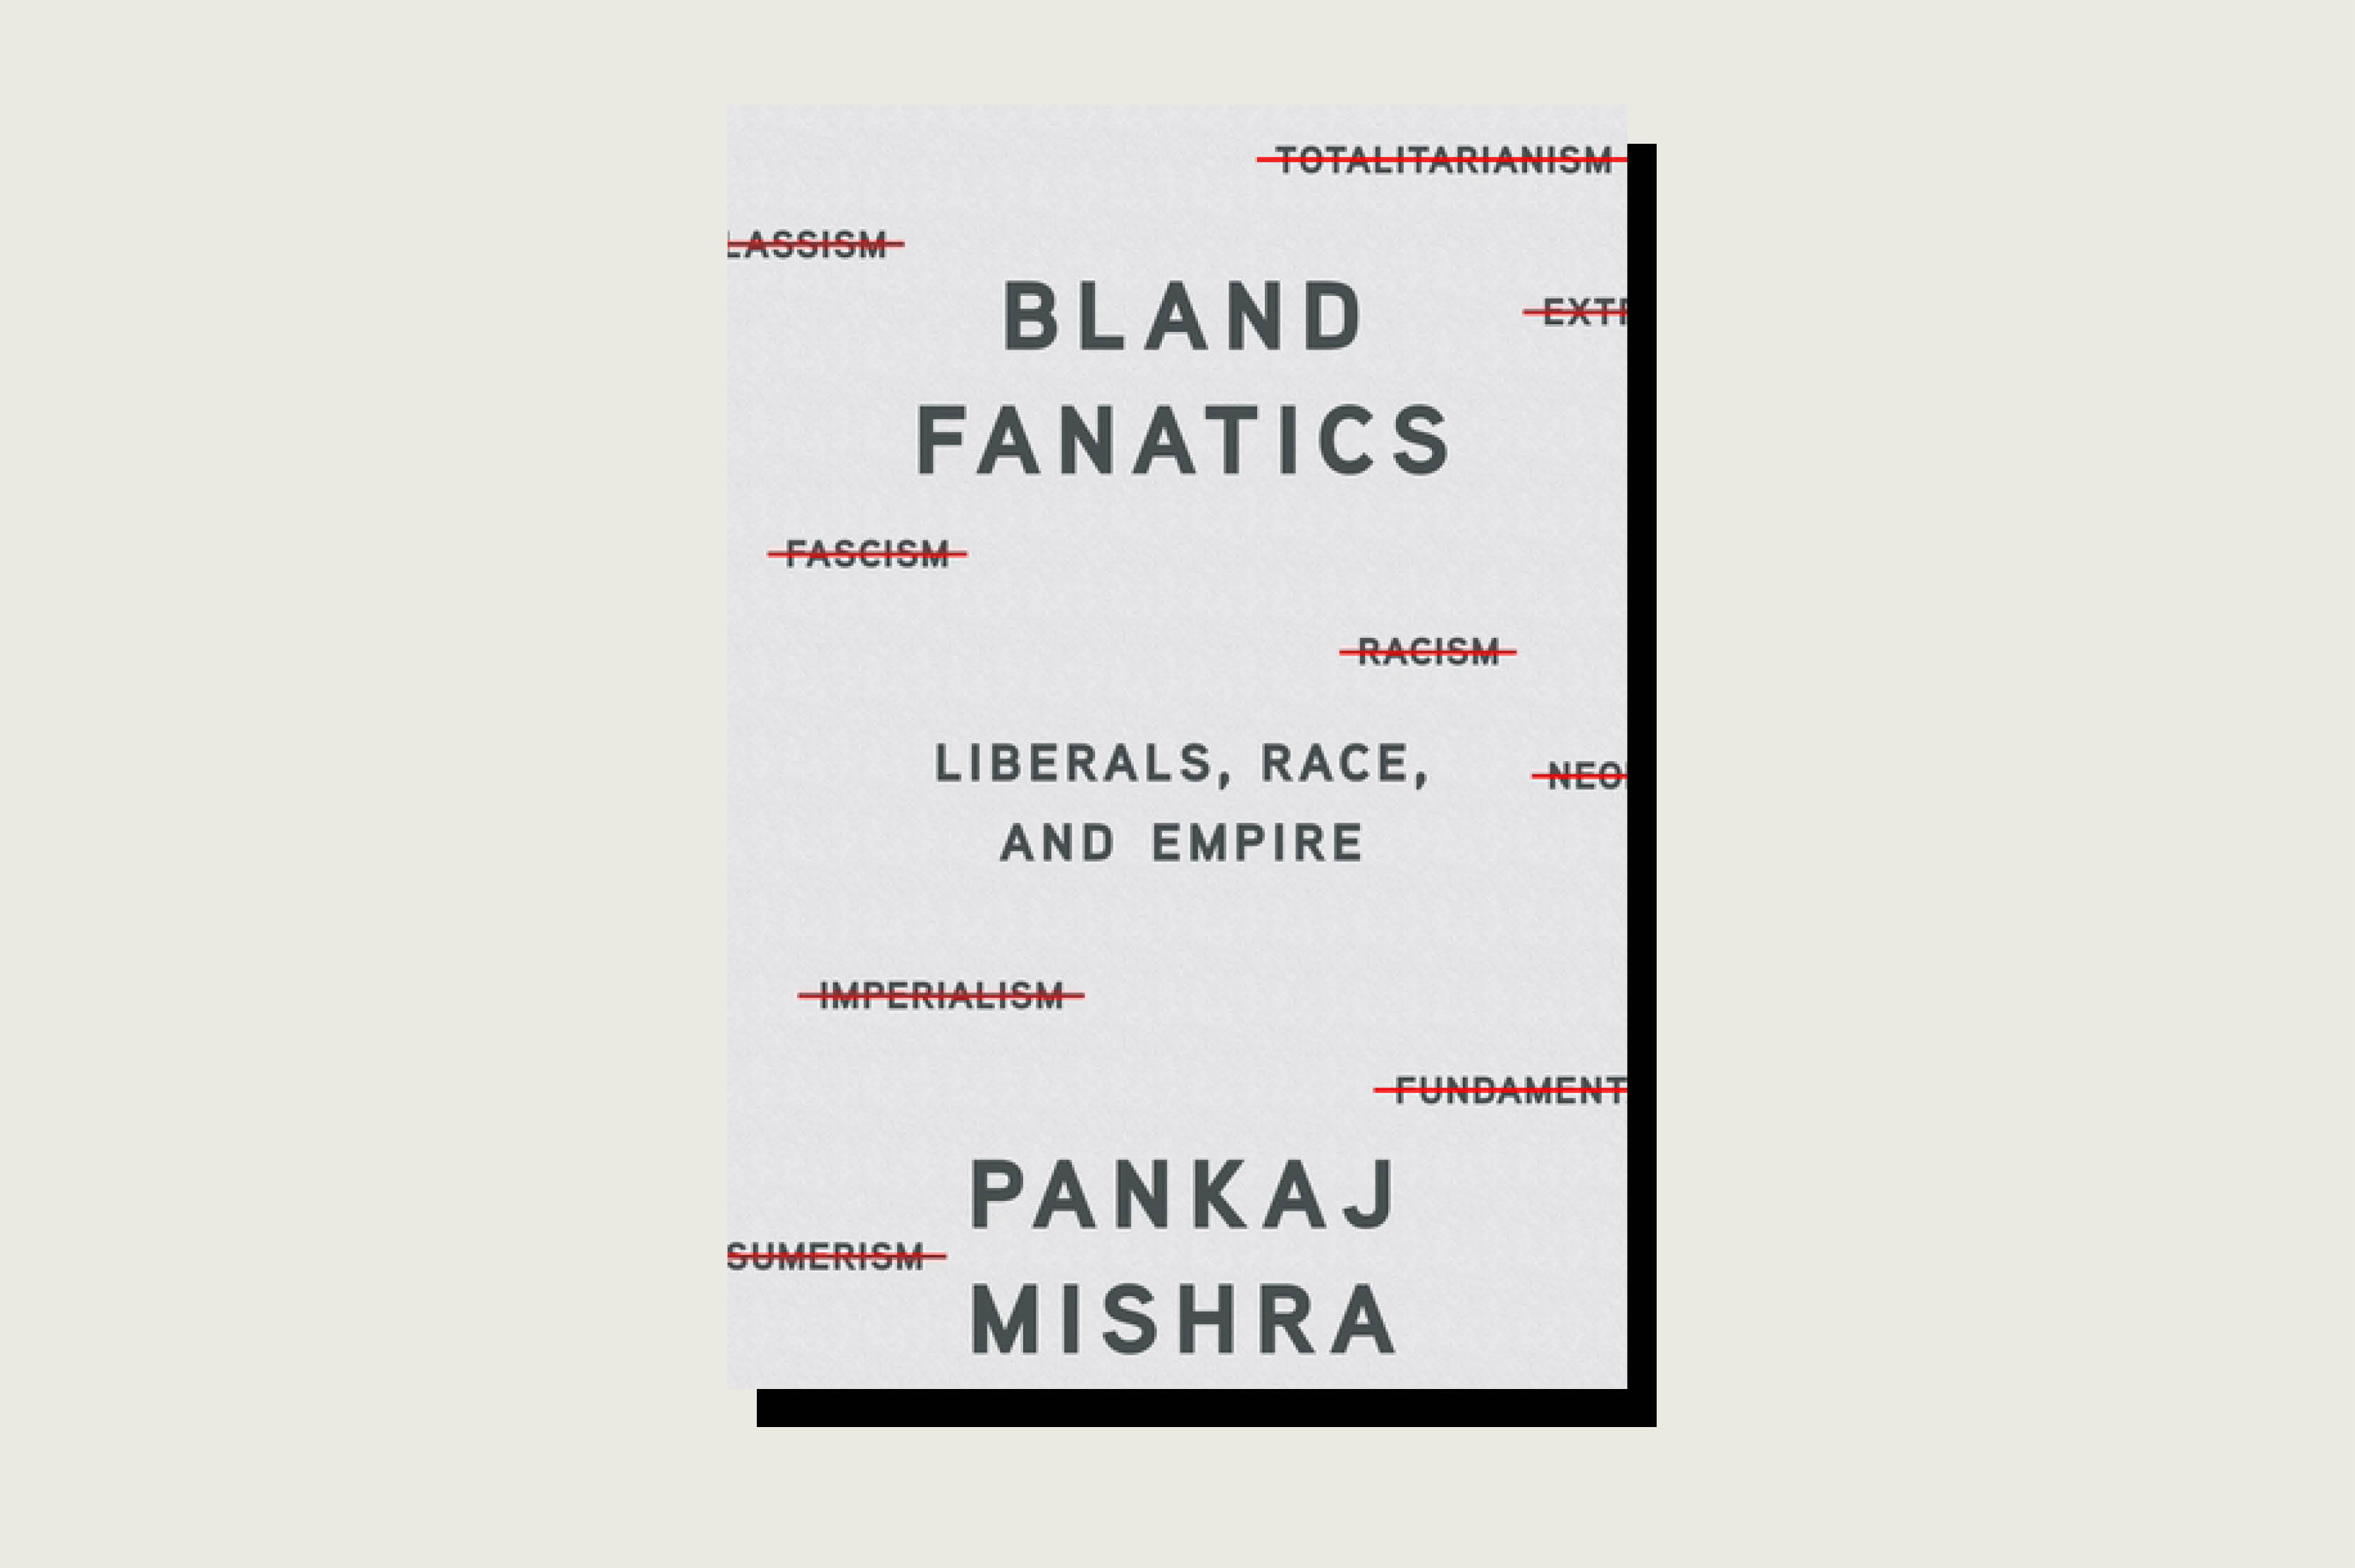 Bland Fanatics: Liberals, Race, and Empire, Pankaj Mishra, Farrar, Straus and Giroux, 224 pp., , October 2020